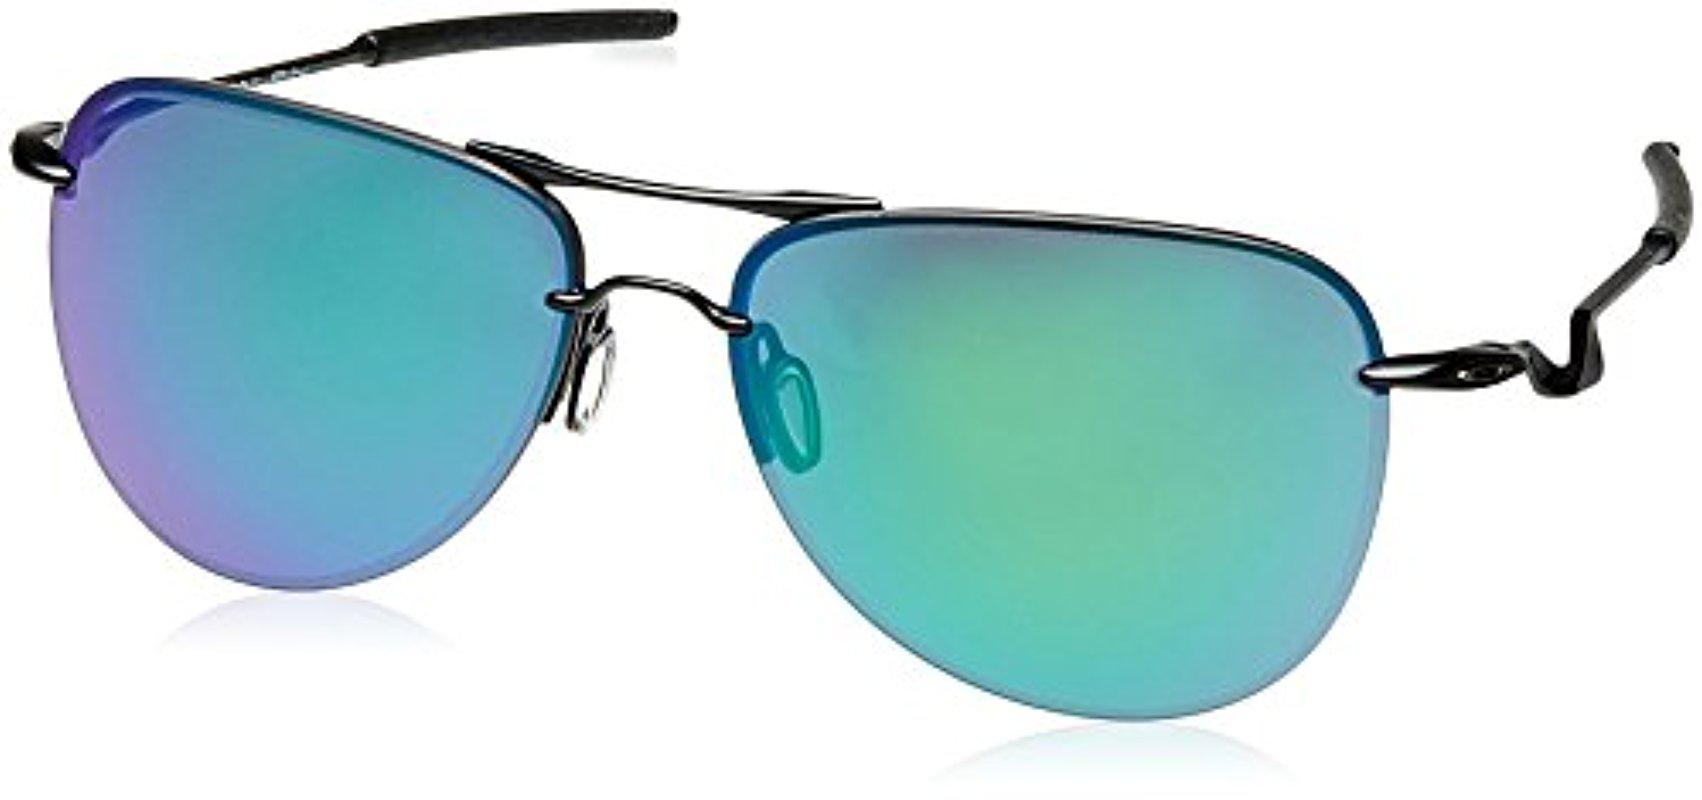 c0d24a2f202 Lyst - Oakley Tailpin Aviator Sunglasses for Men